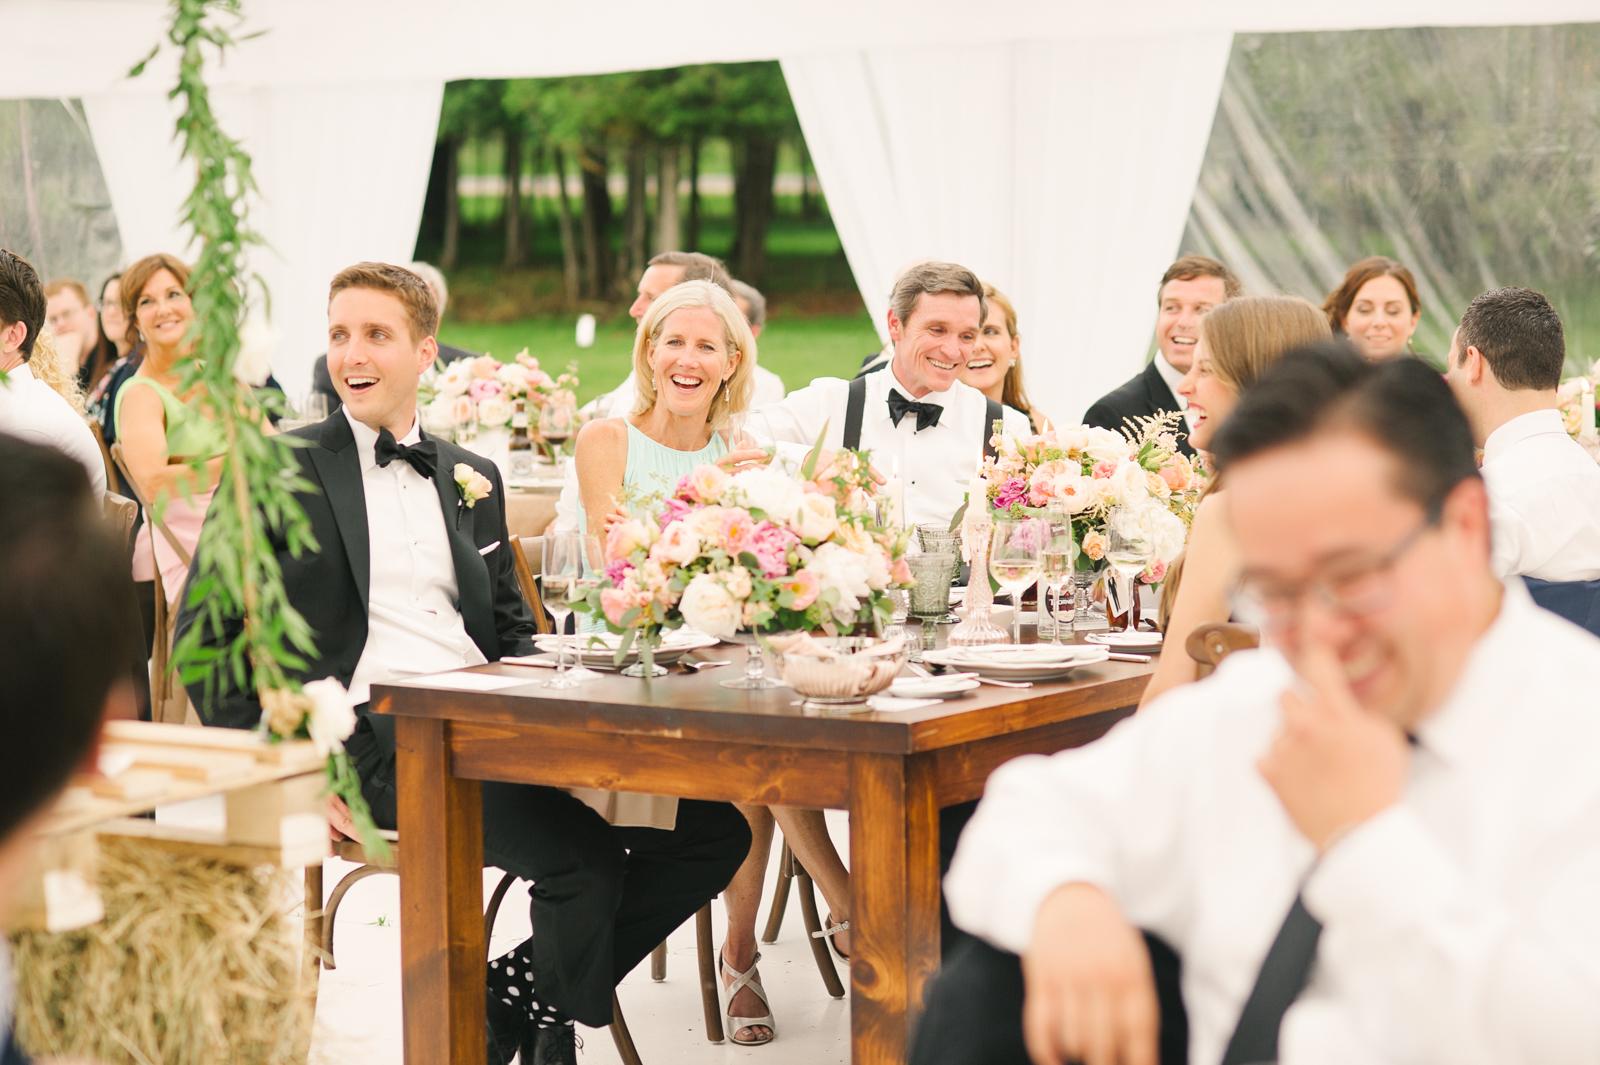 tara mcmullen photography toronto wedding photographer private estate wedding toronto cynthia martyn events toronto westway tents zuhair murad gown at-home wedding toronto-039